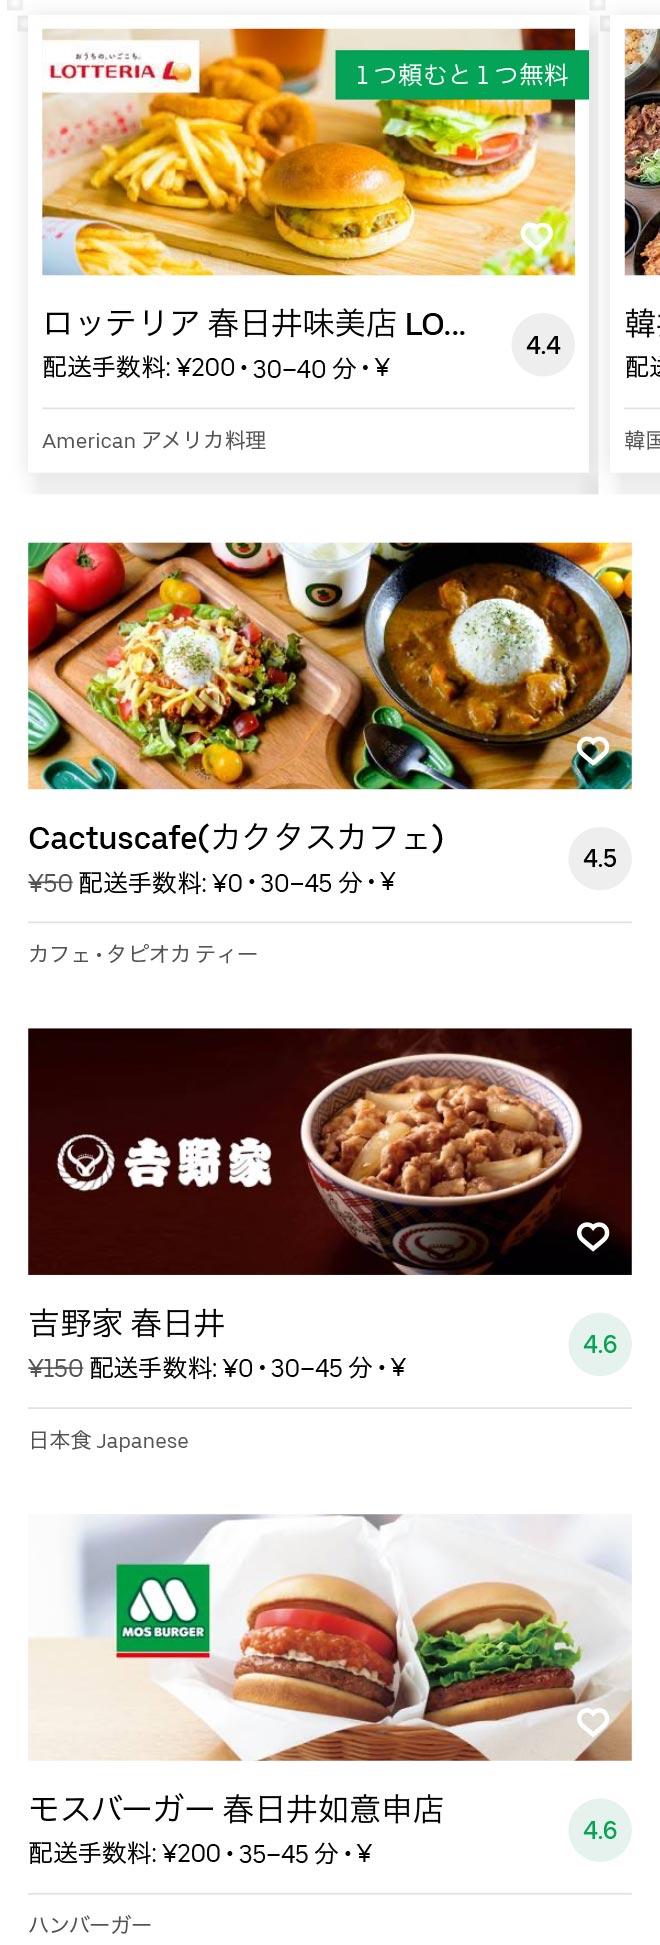 Kachigawa menu 2010 03